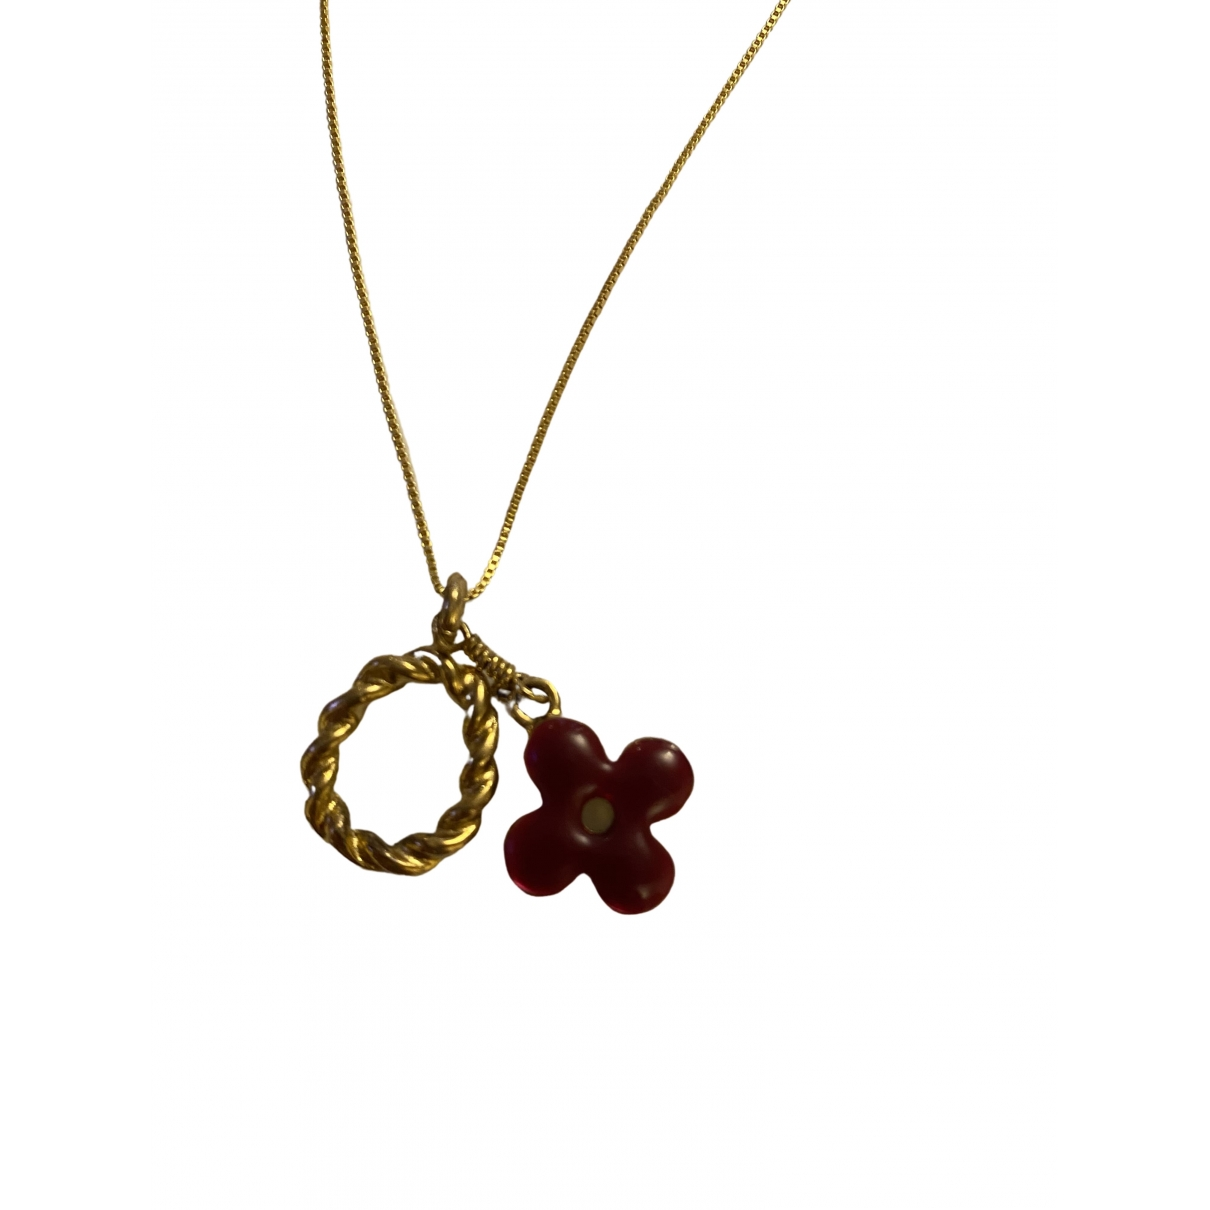 Louis Vuitton \N Kette in  Gold Metall